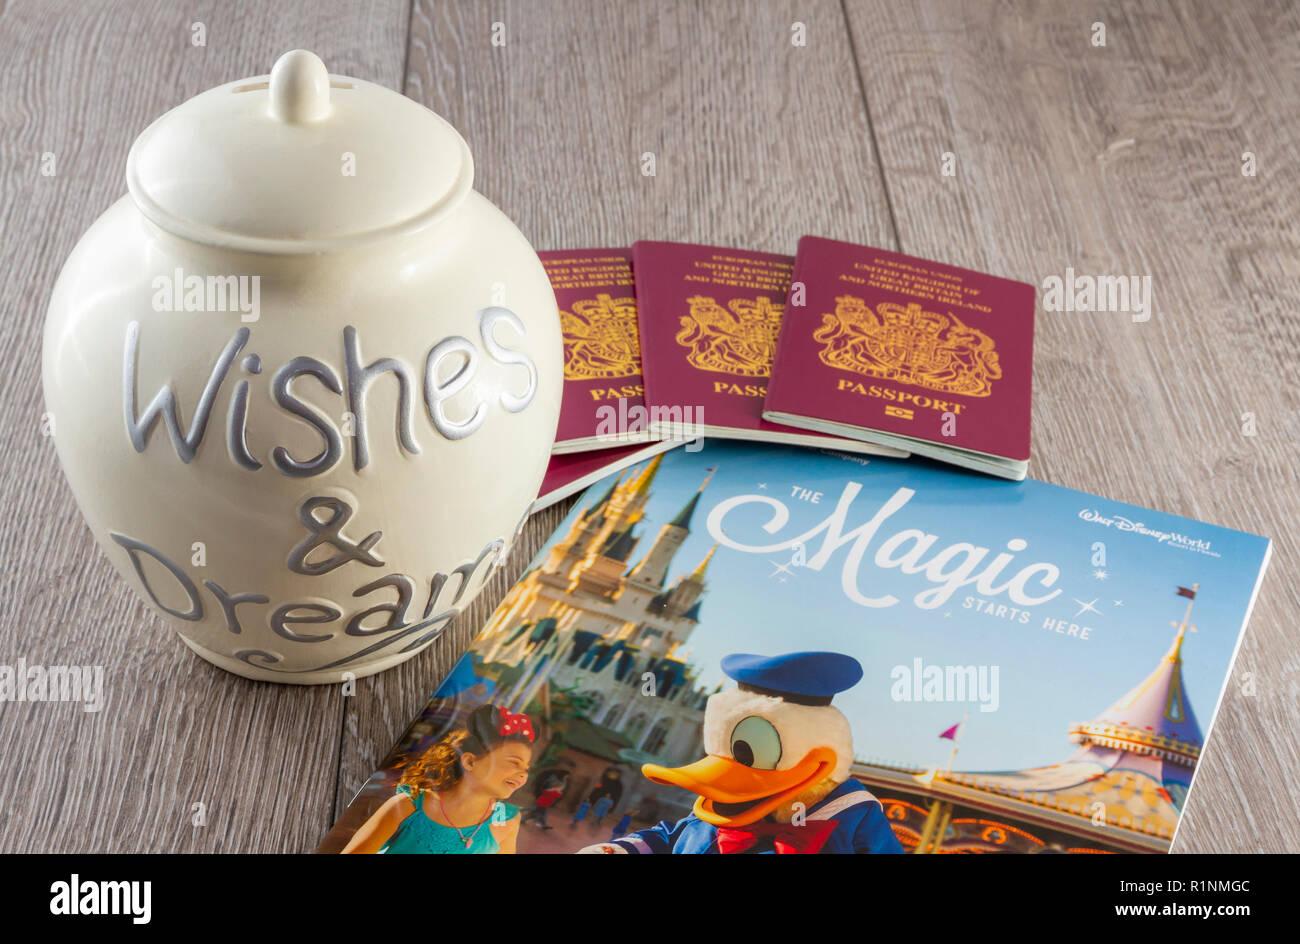 British passports and a savings jar with a Disney World Travel Brochure - Stock Image